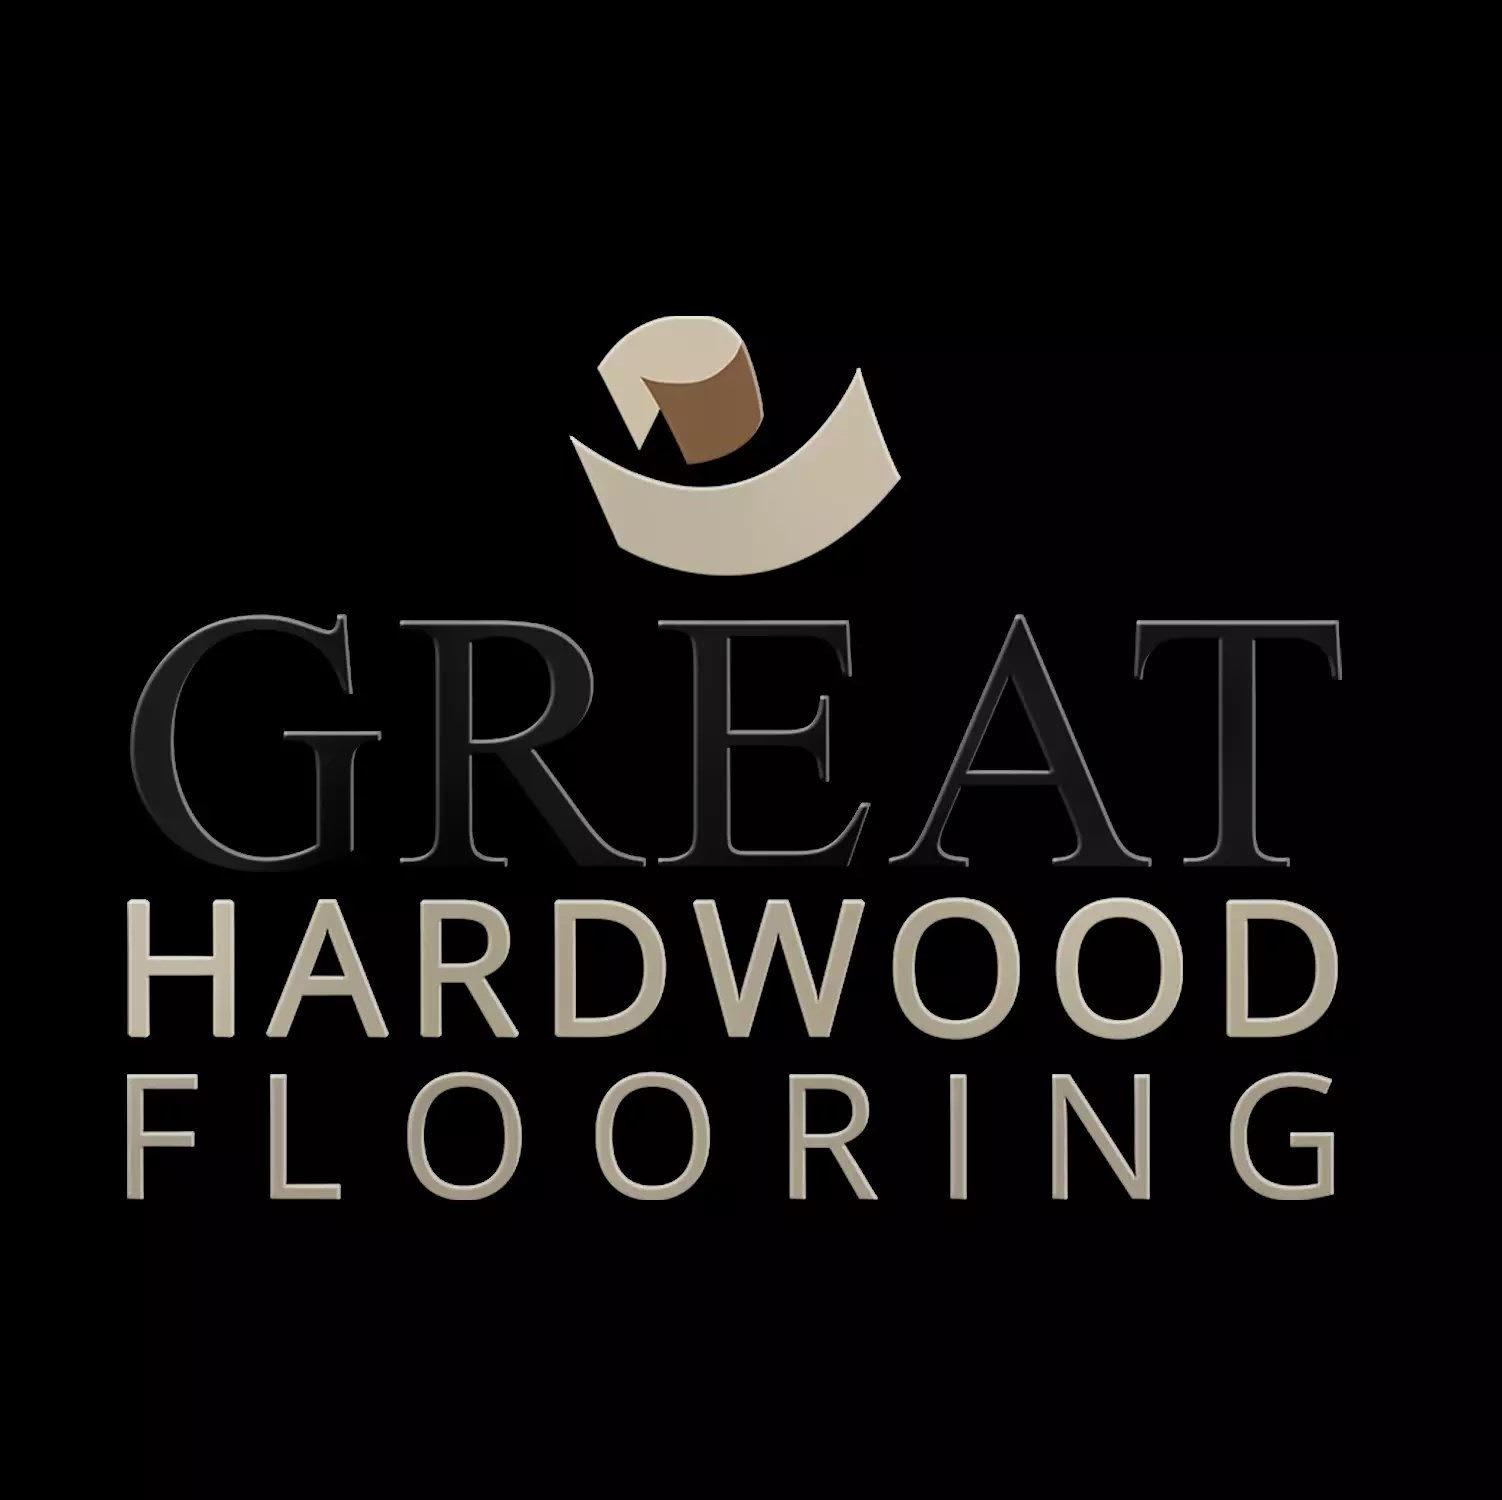 Great Hardwood Flooring Inc